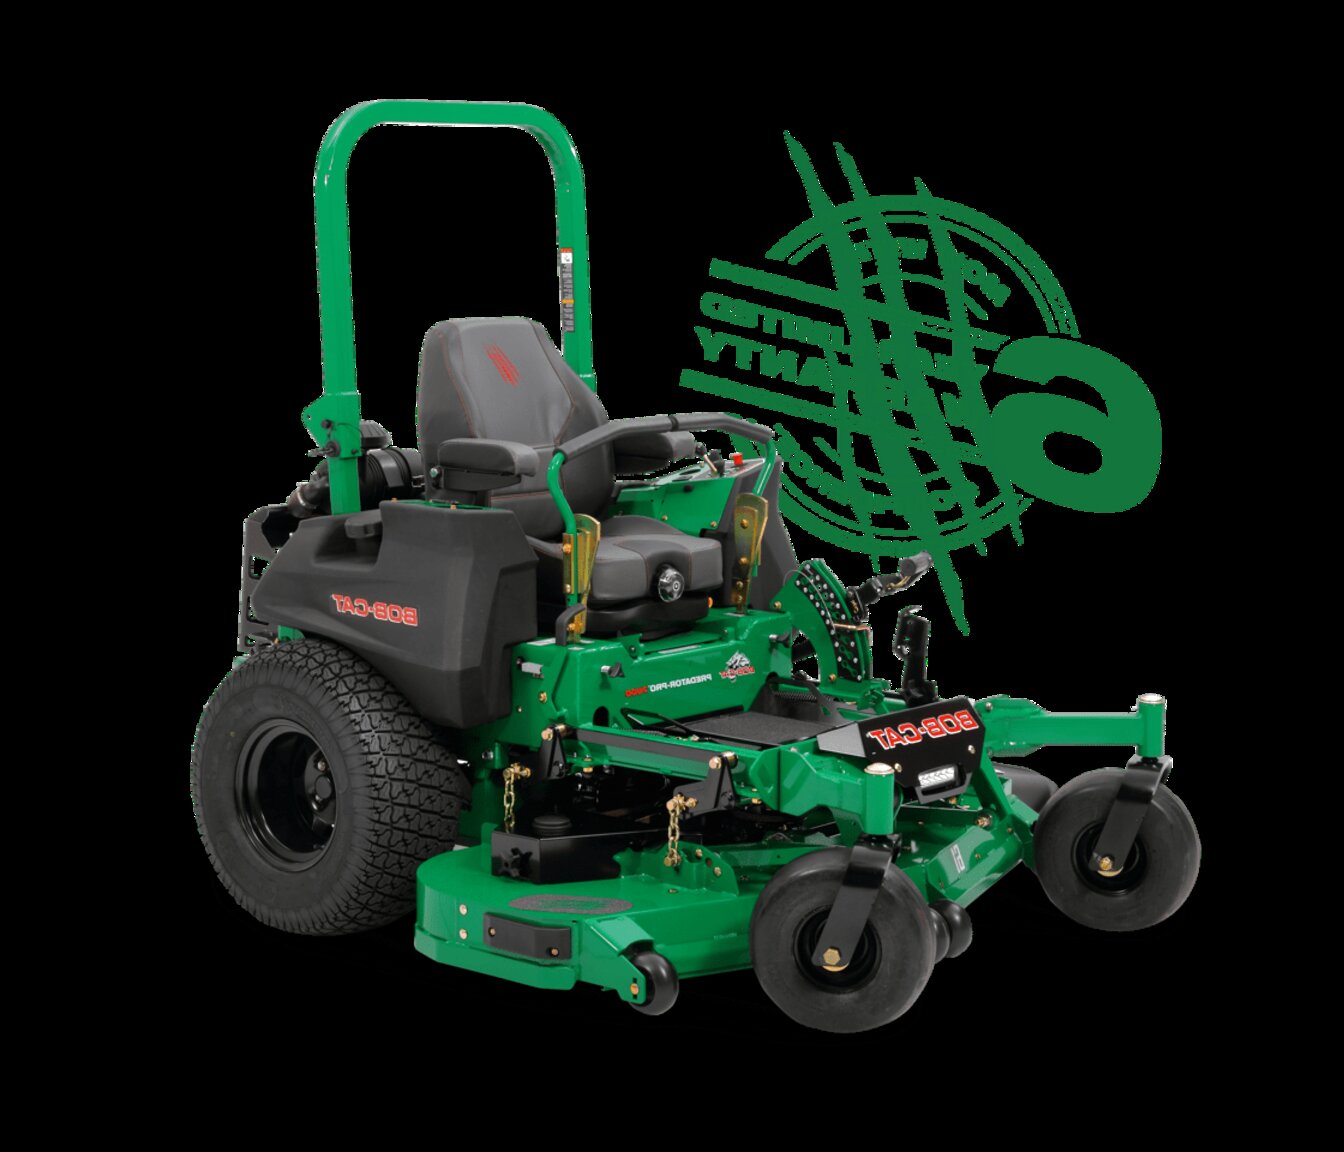 bobcat zero turn mower for sale